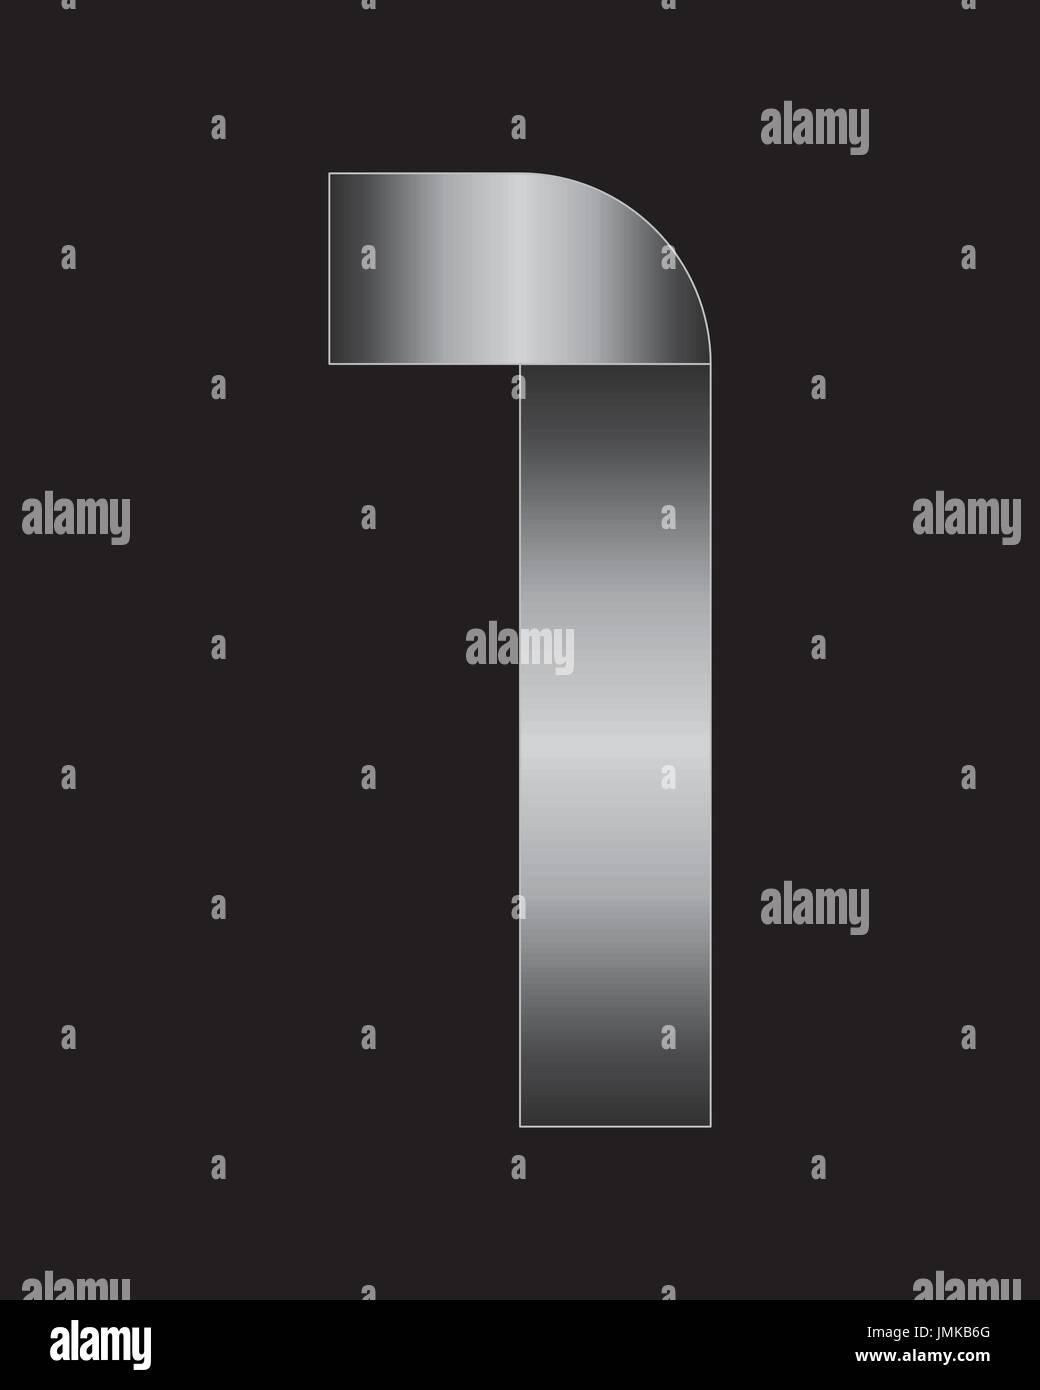 Rectangular de metal doblado font - número 1 Imagen De Stock